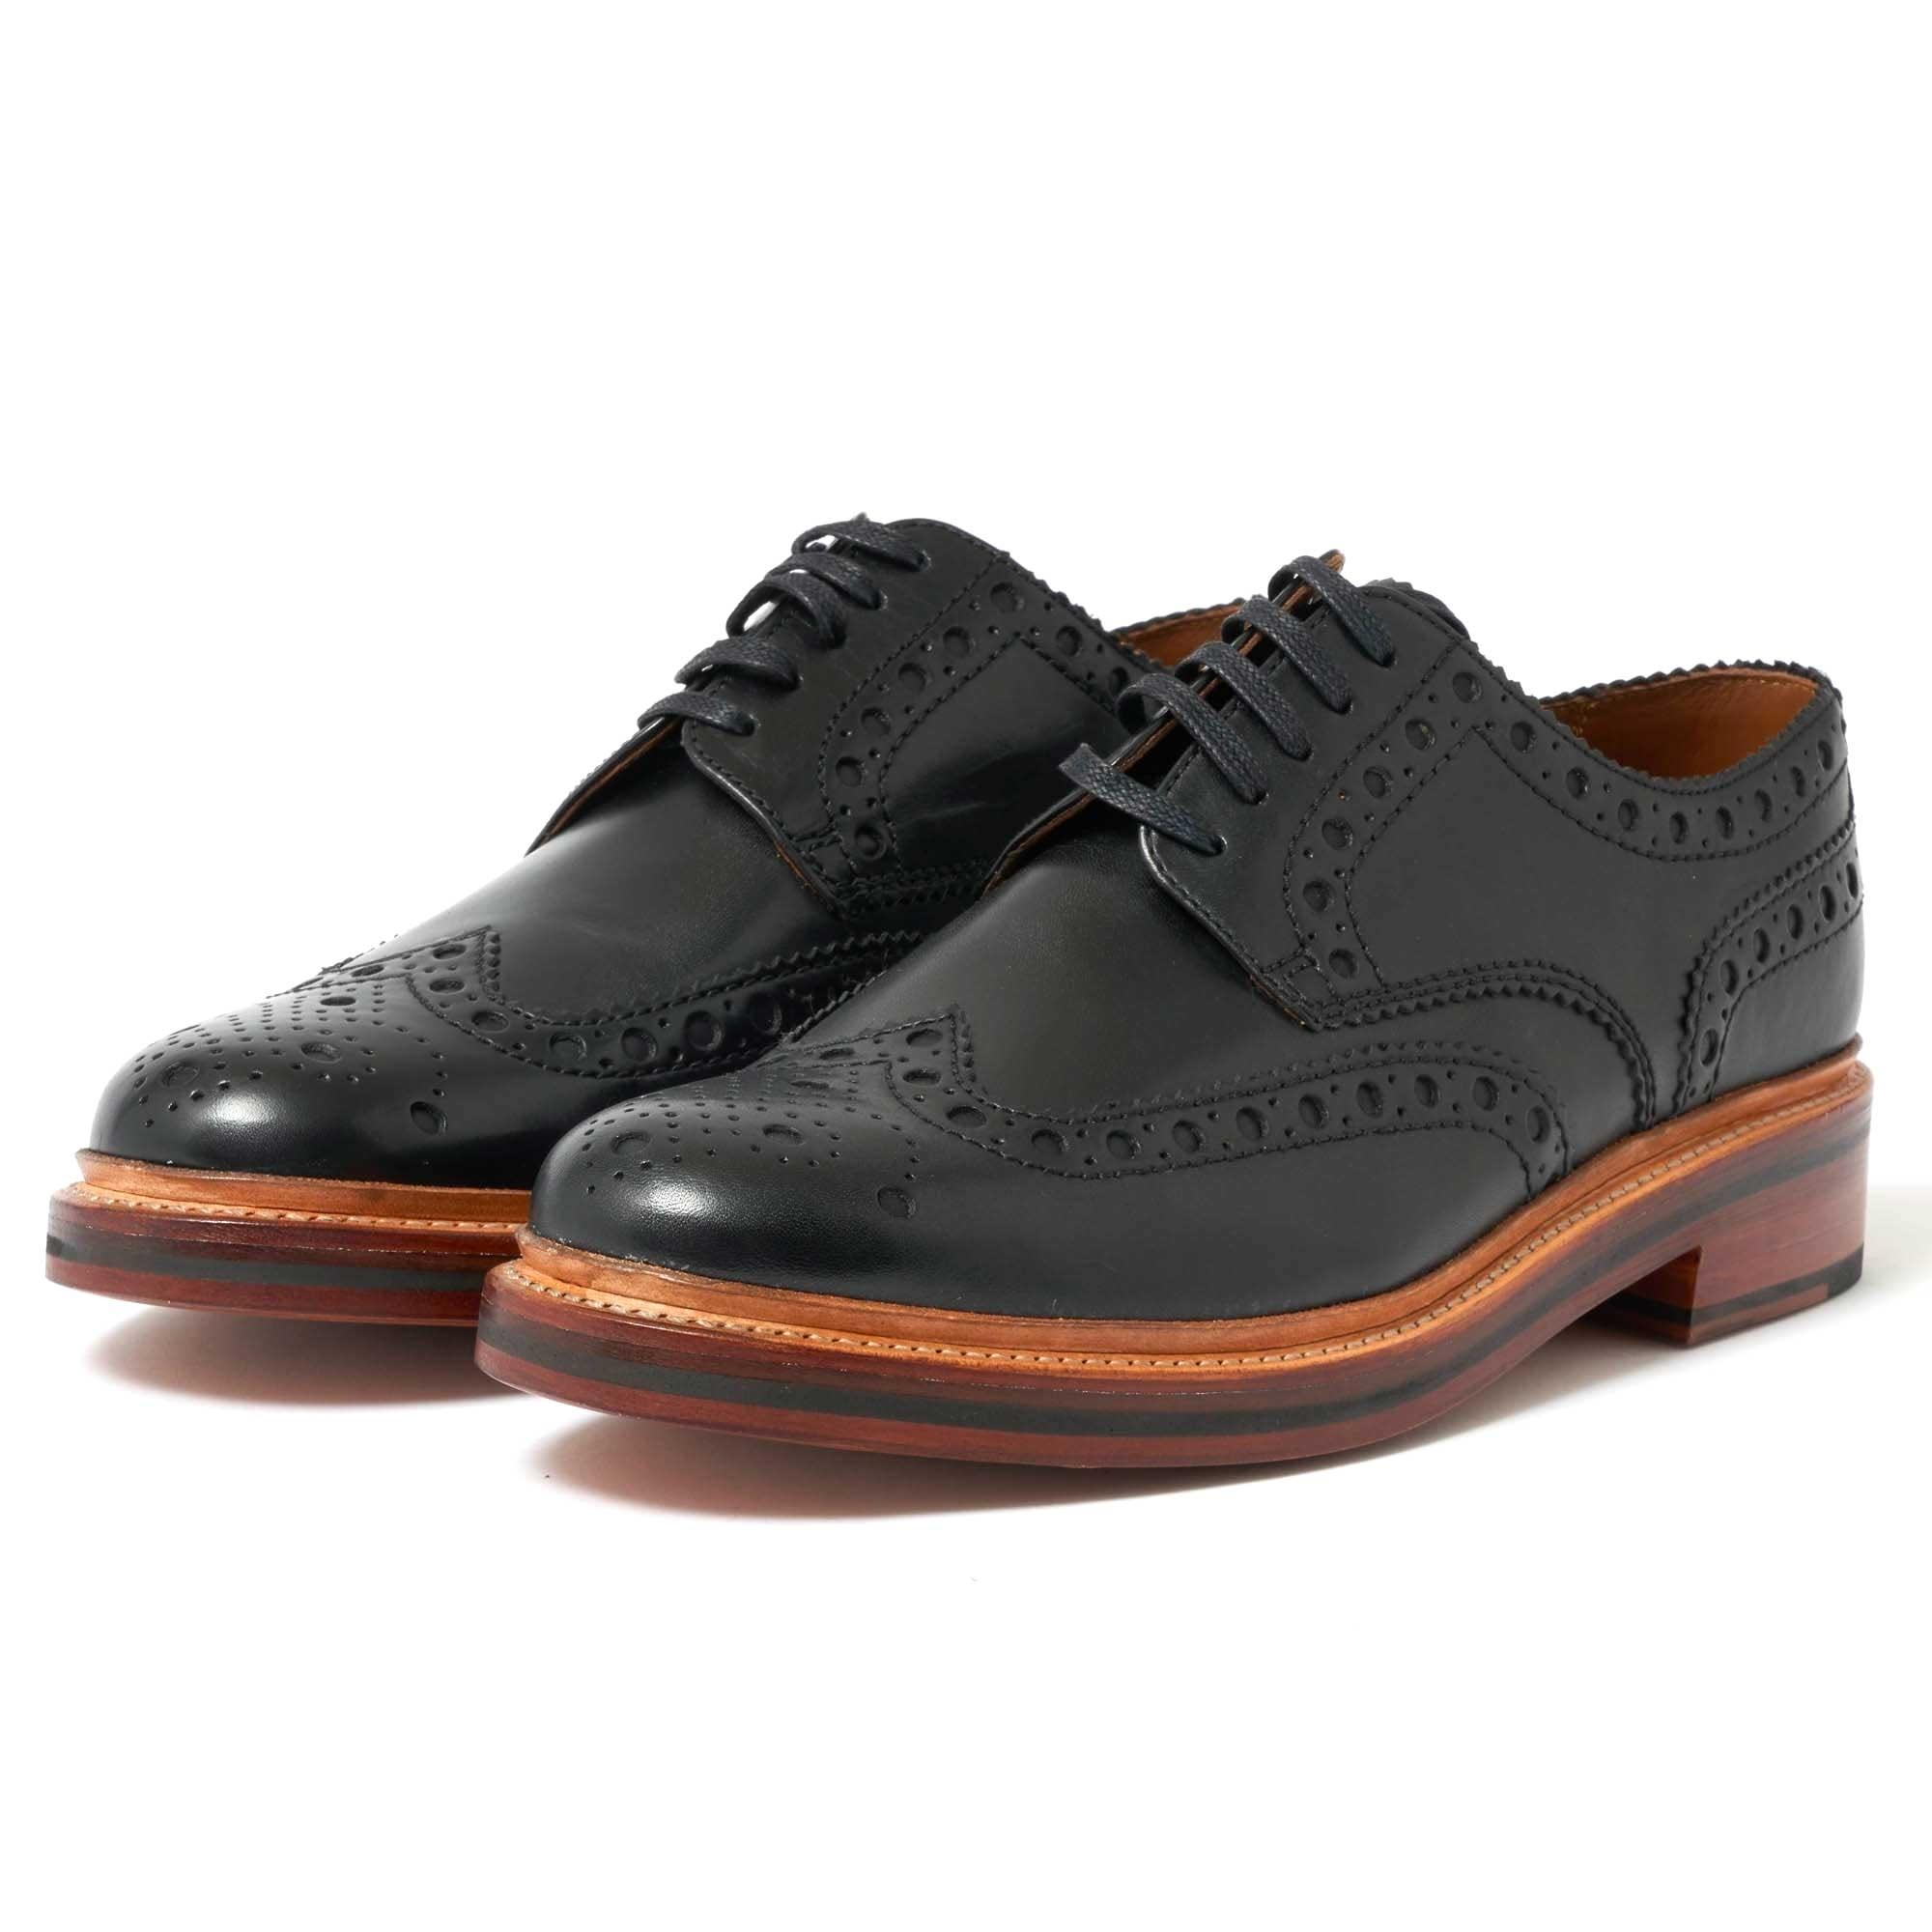 Grenson London | Archie Black Brogue Shoes